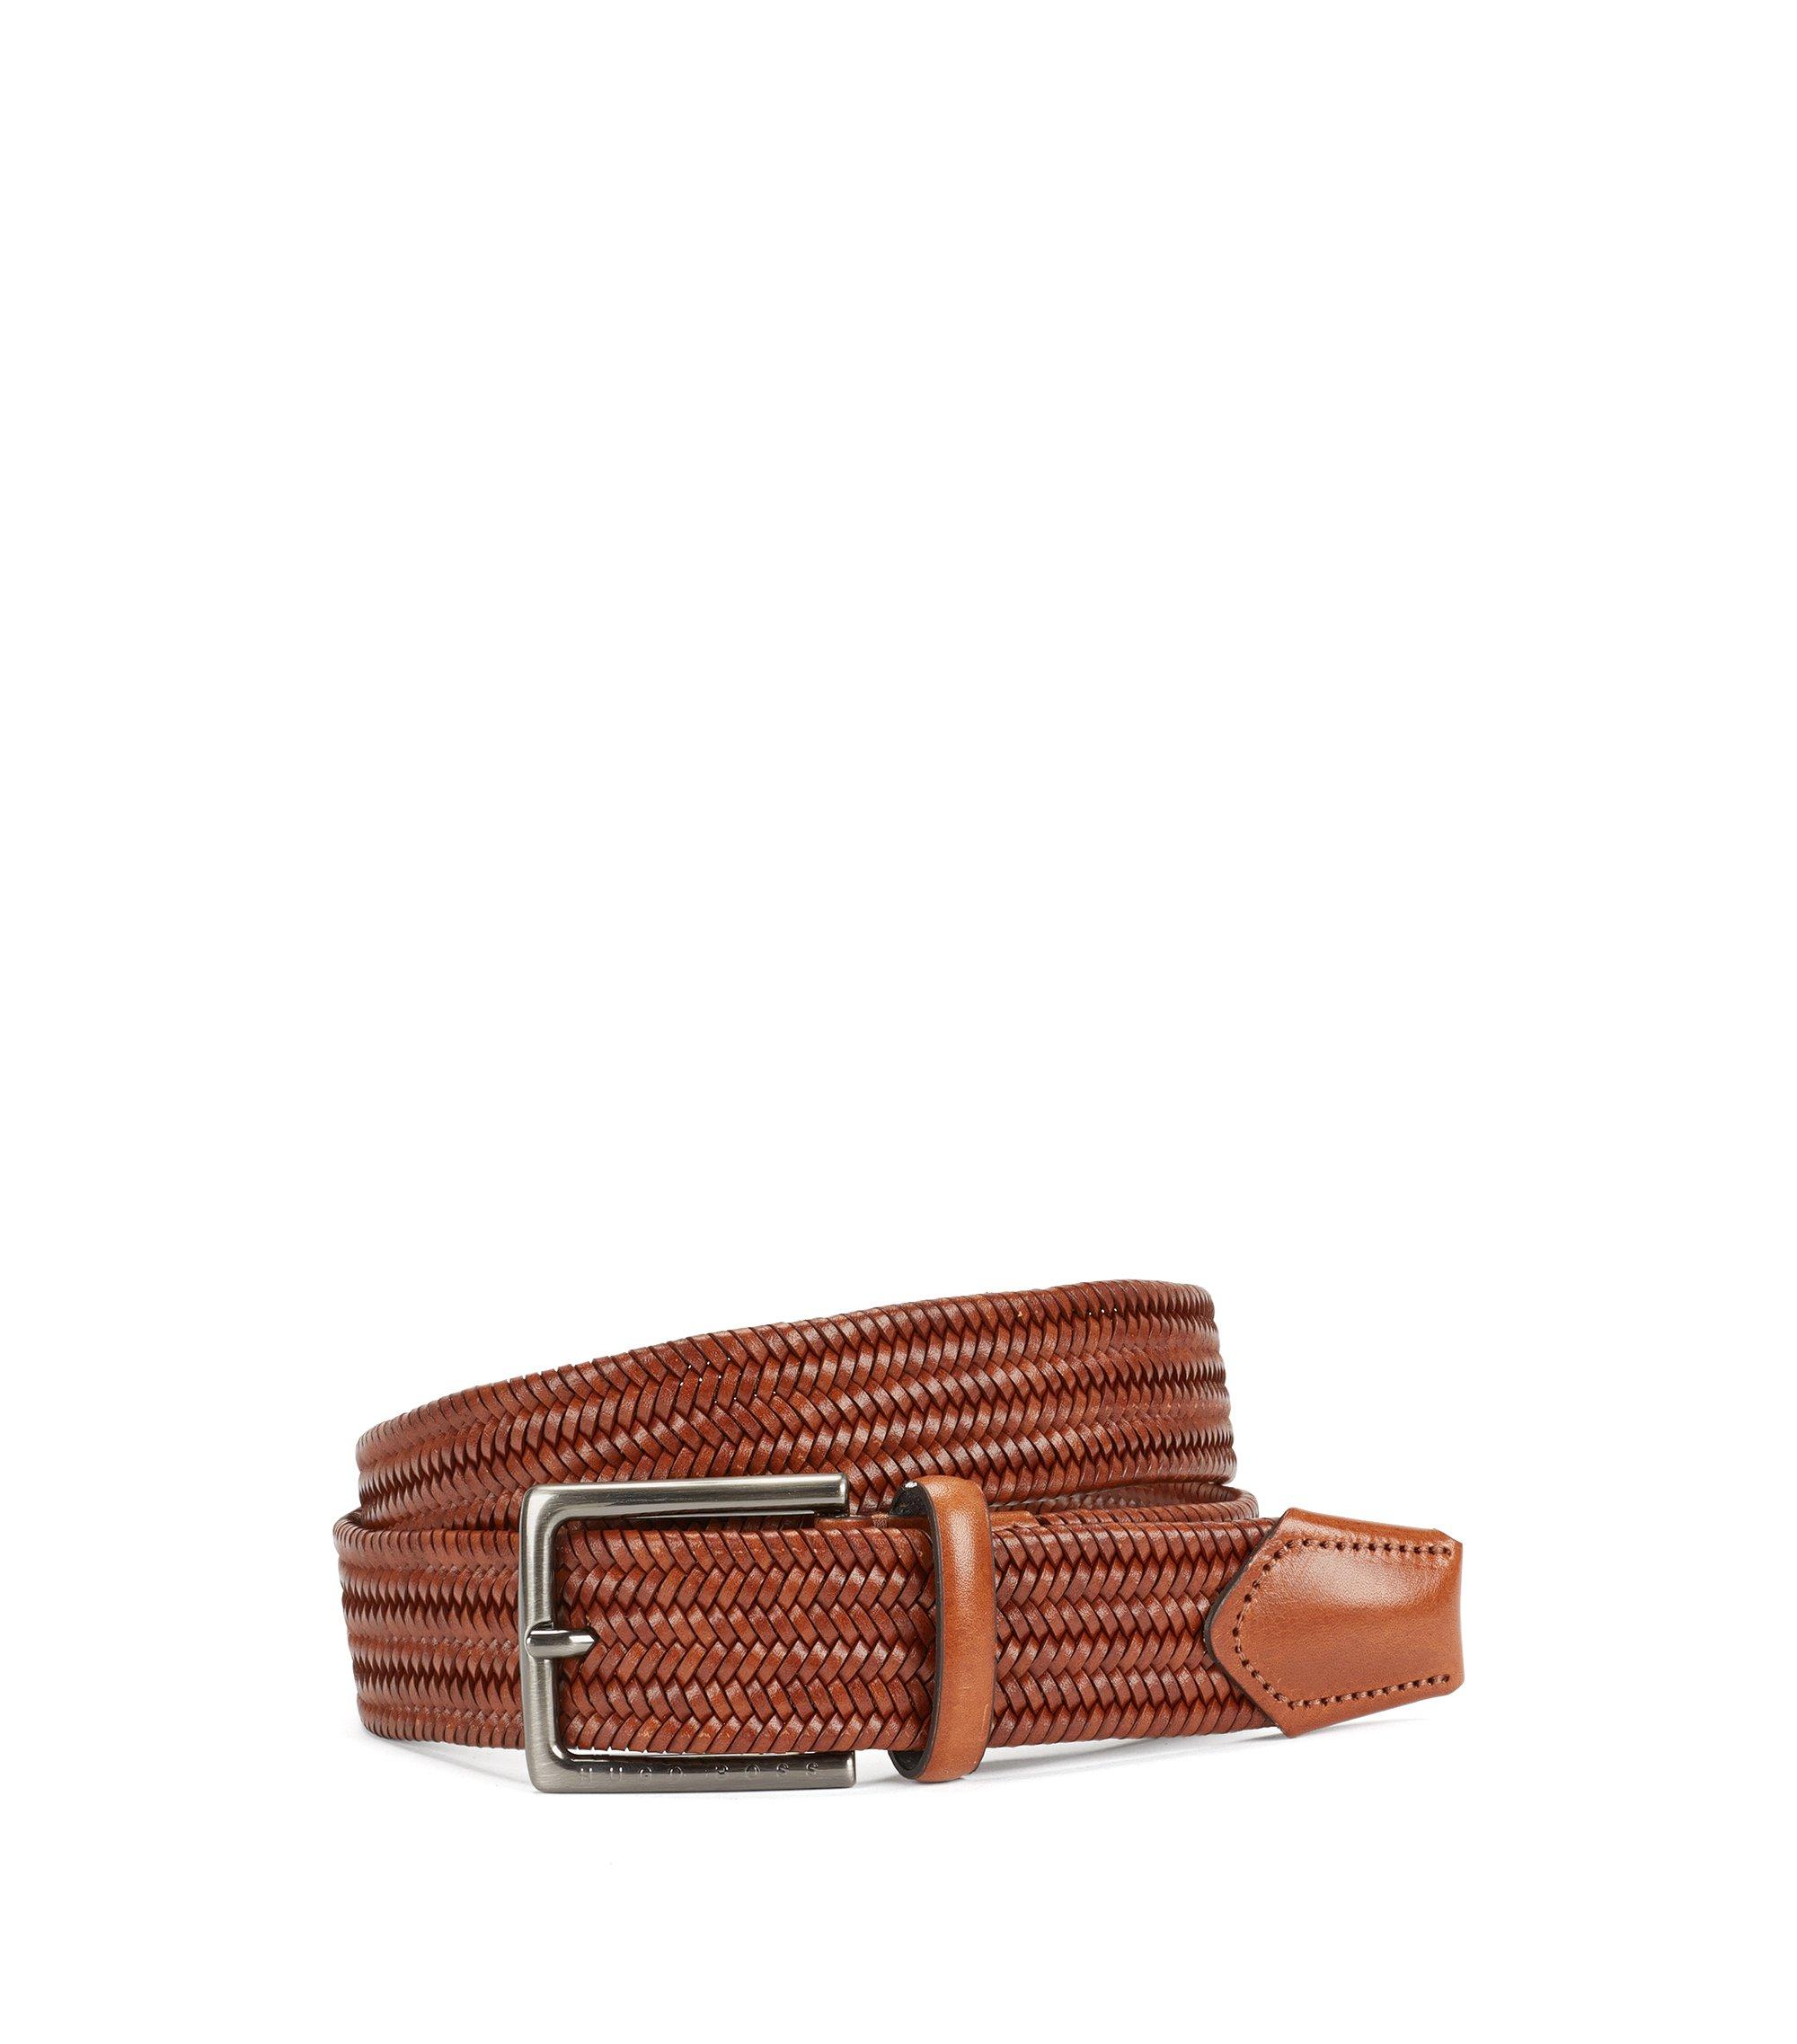 Leather Handcrafted Braided Belt | Semyo Sz35 Mxwn, Brown